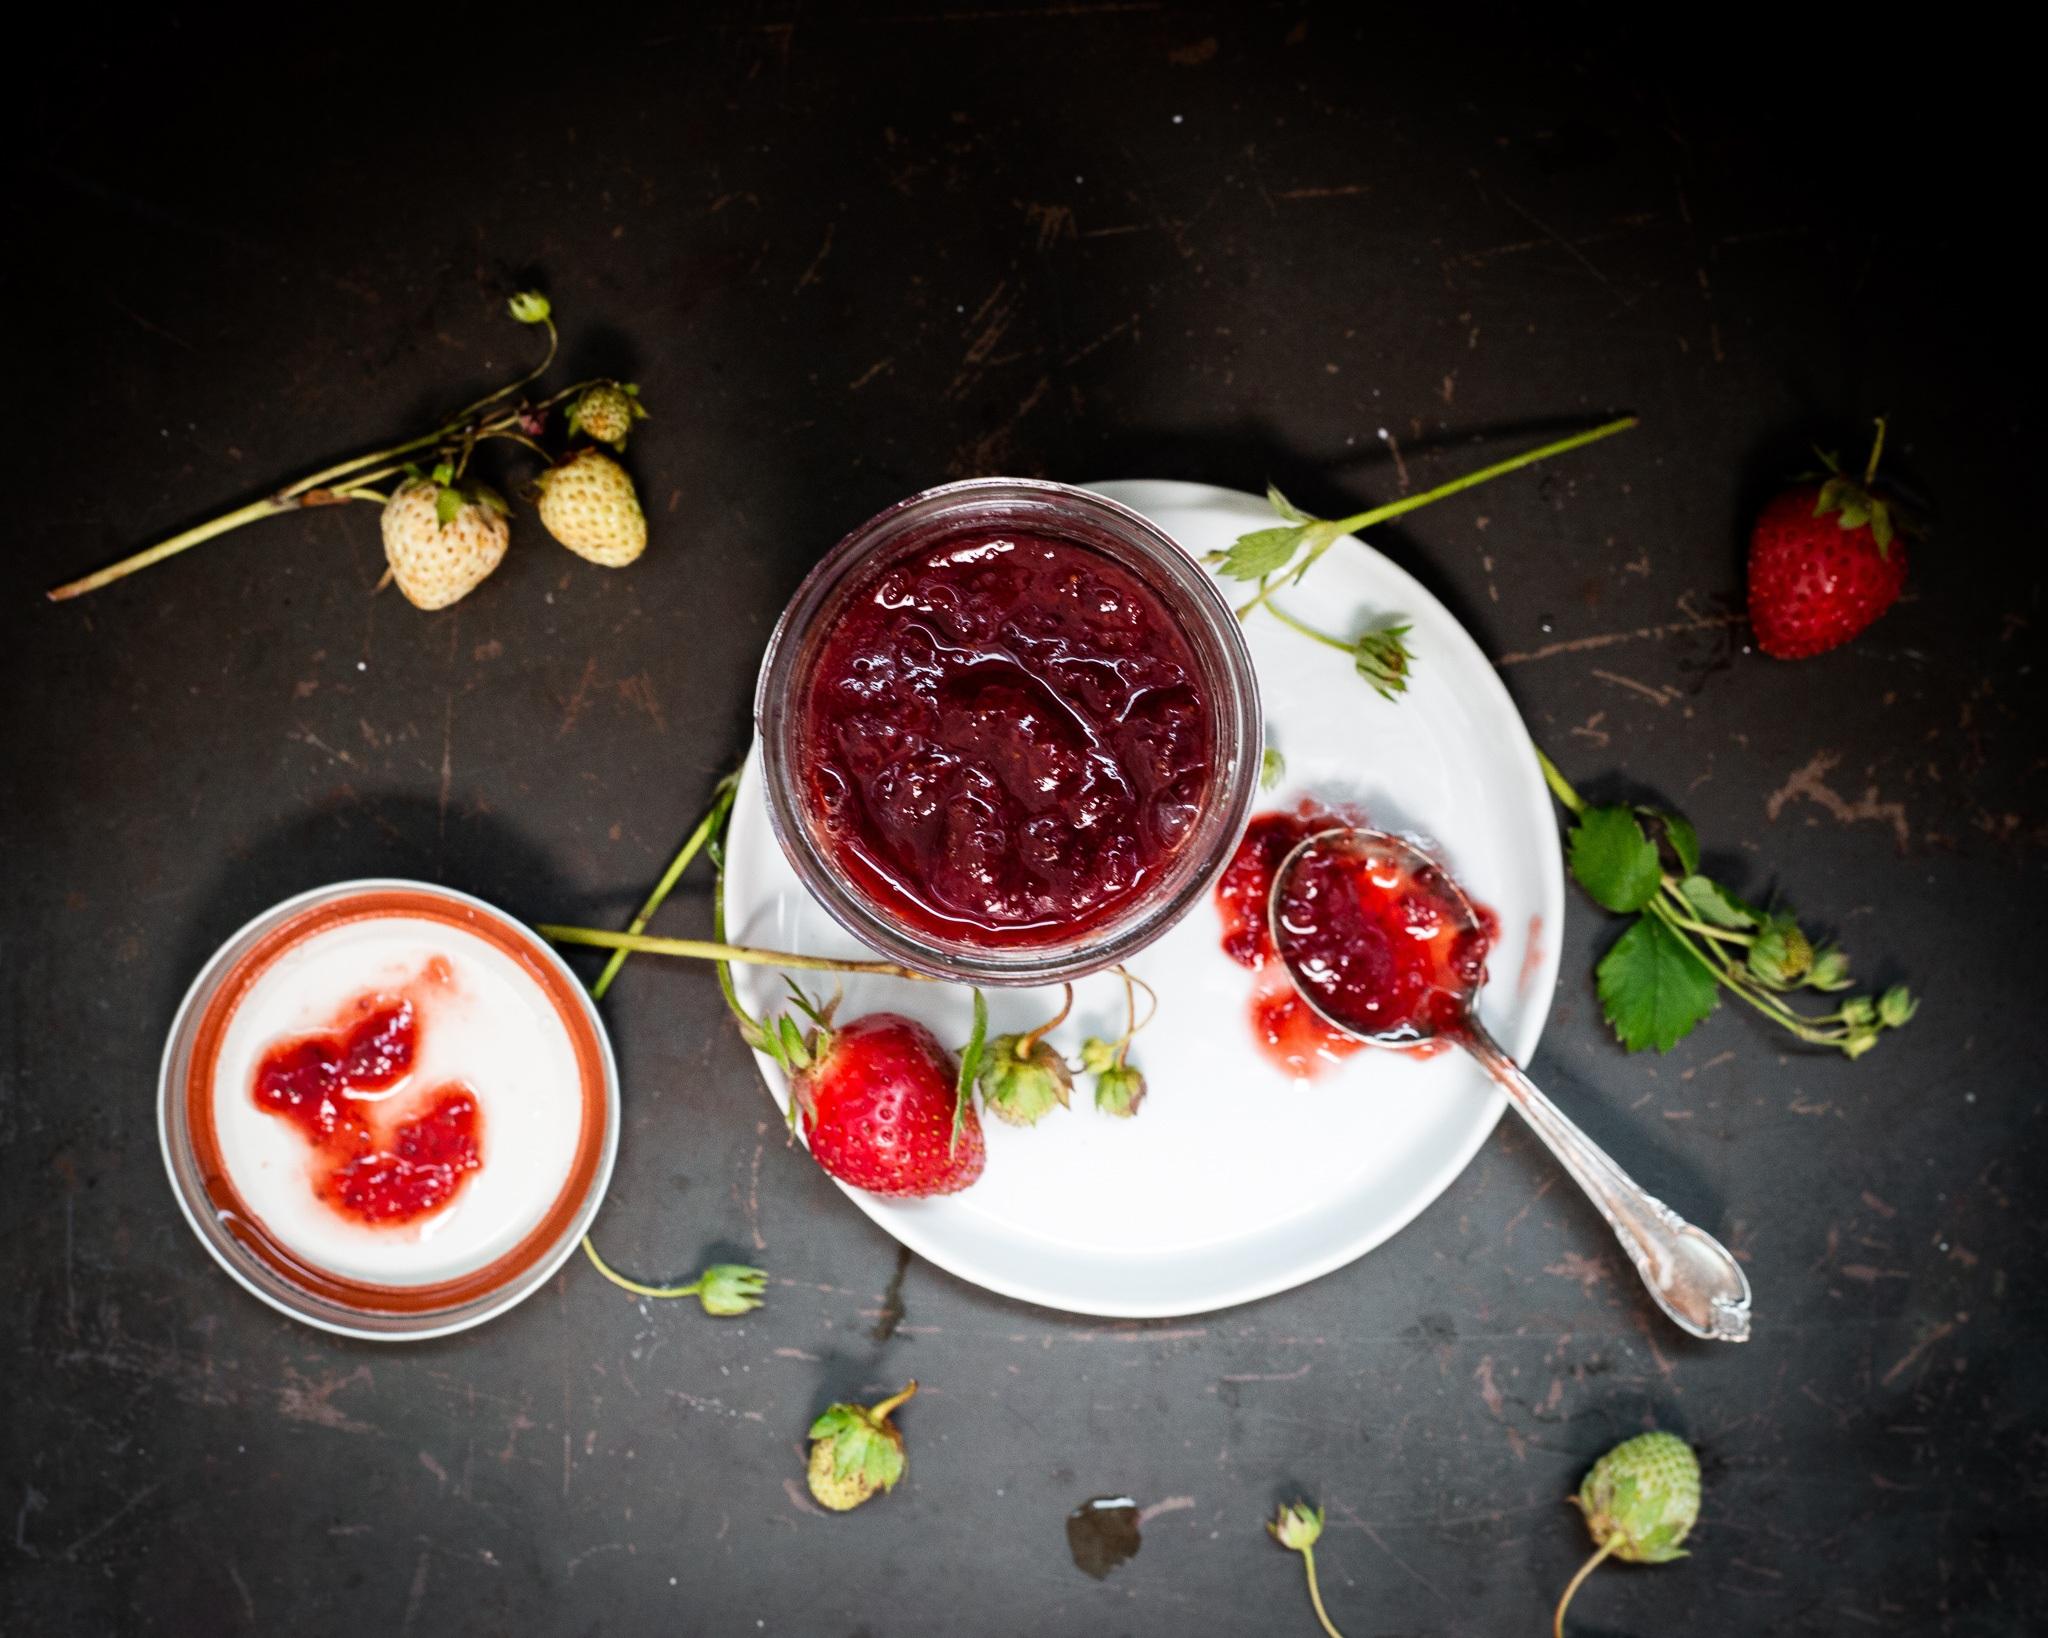 Honey Strawberry Jam: Water bath canning